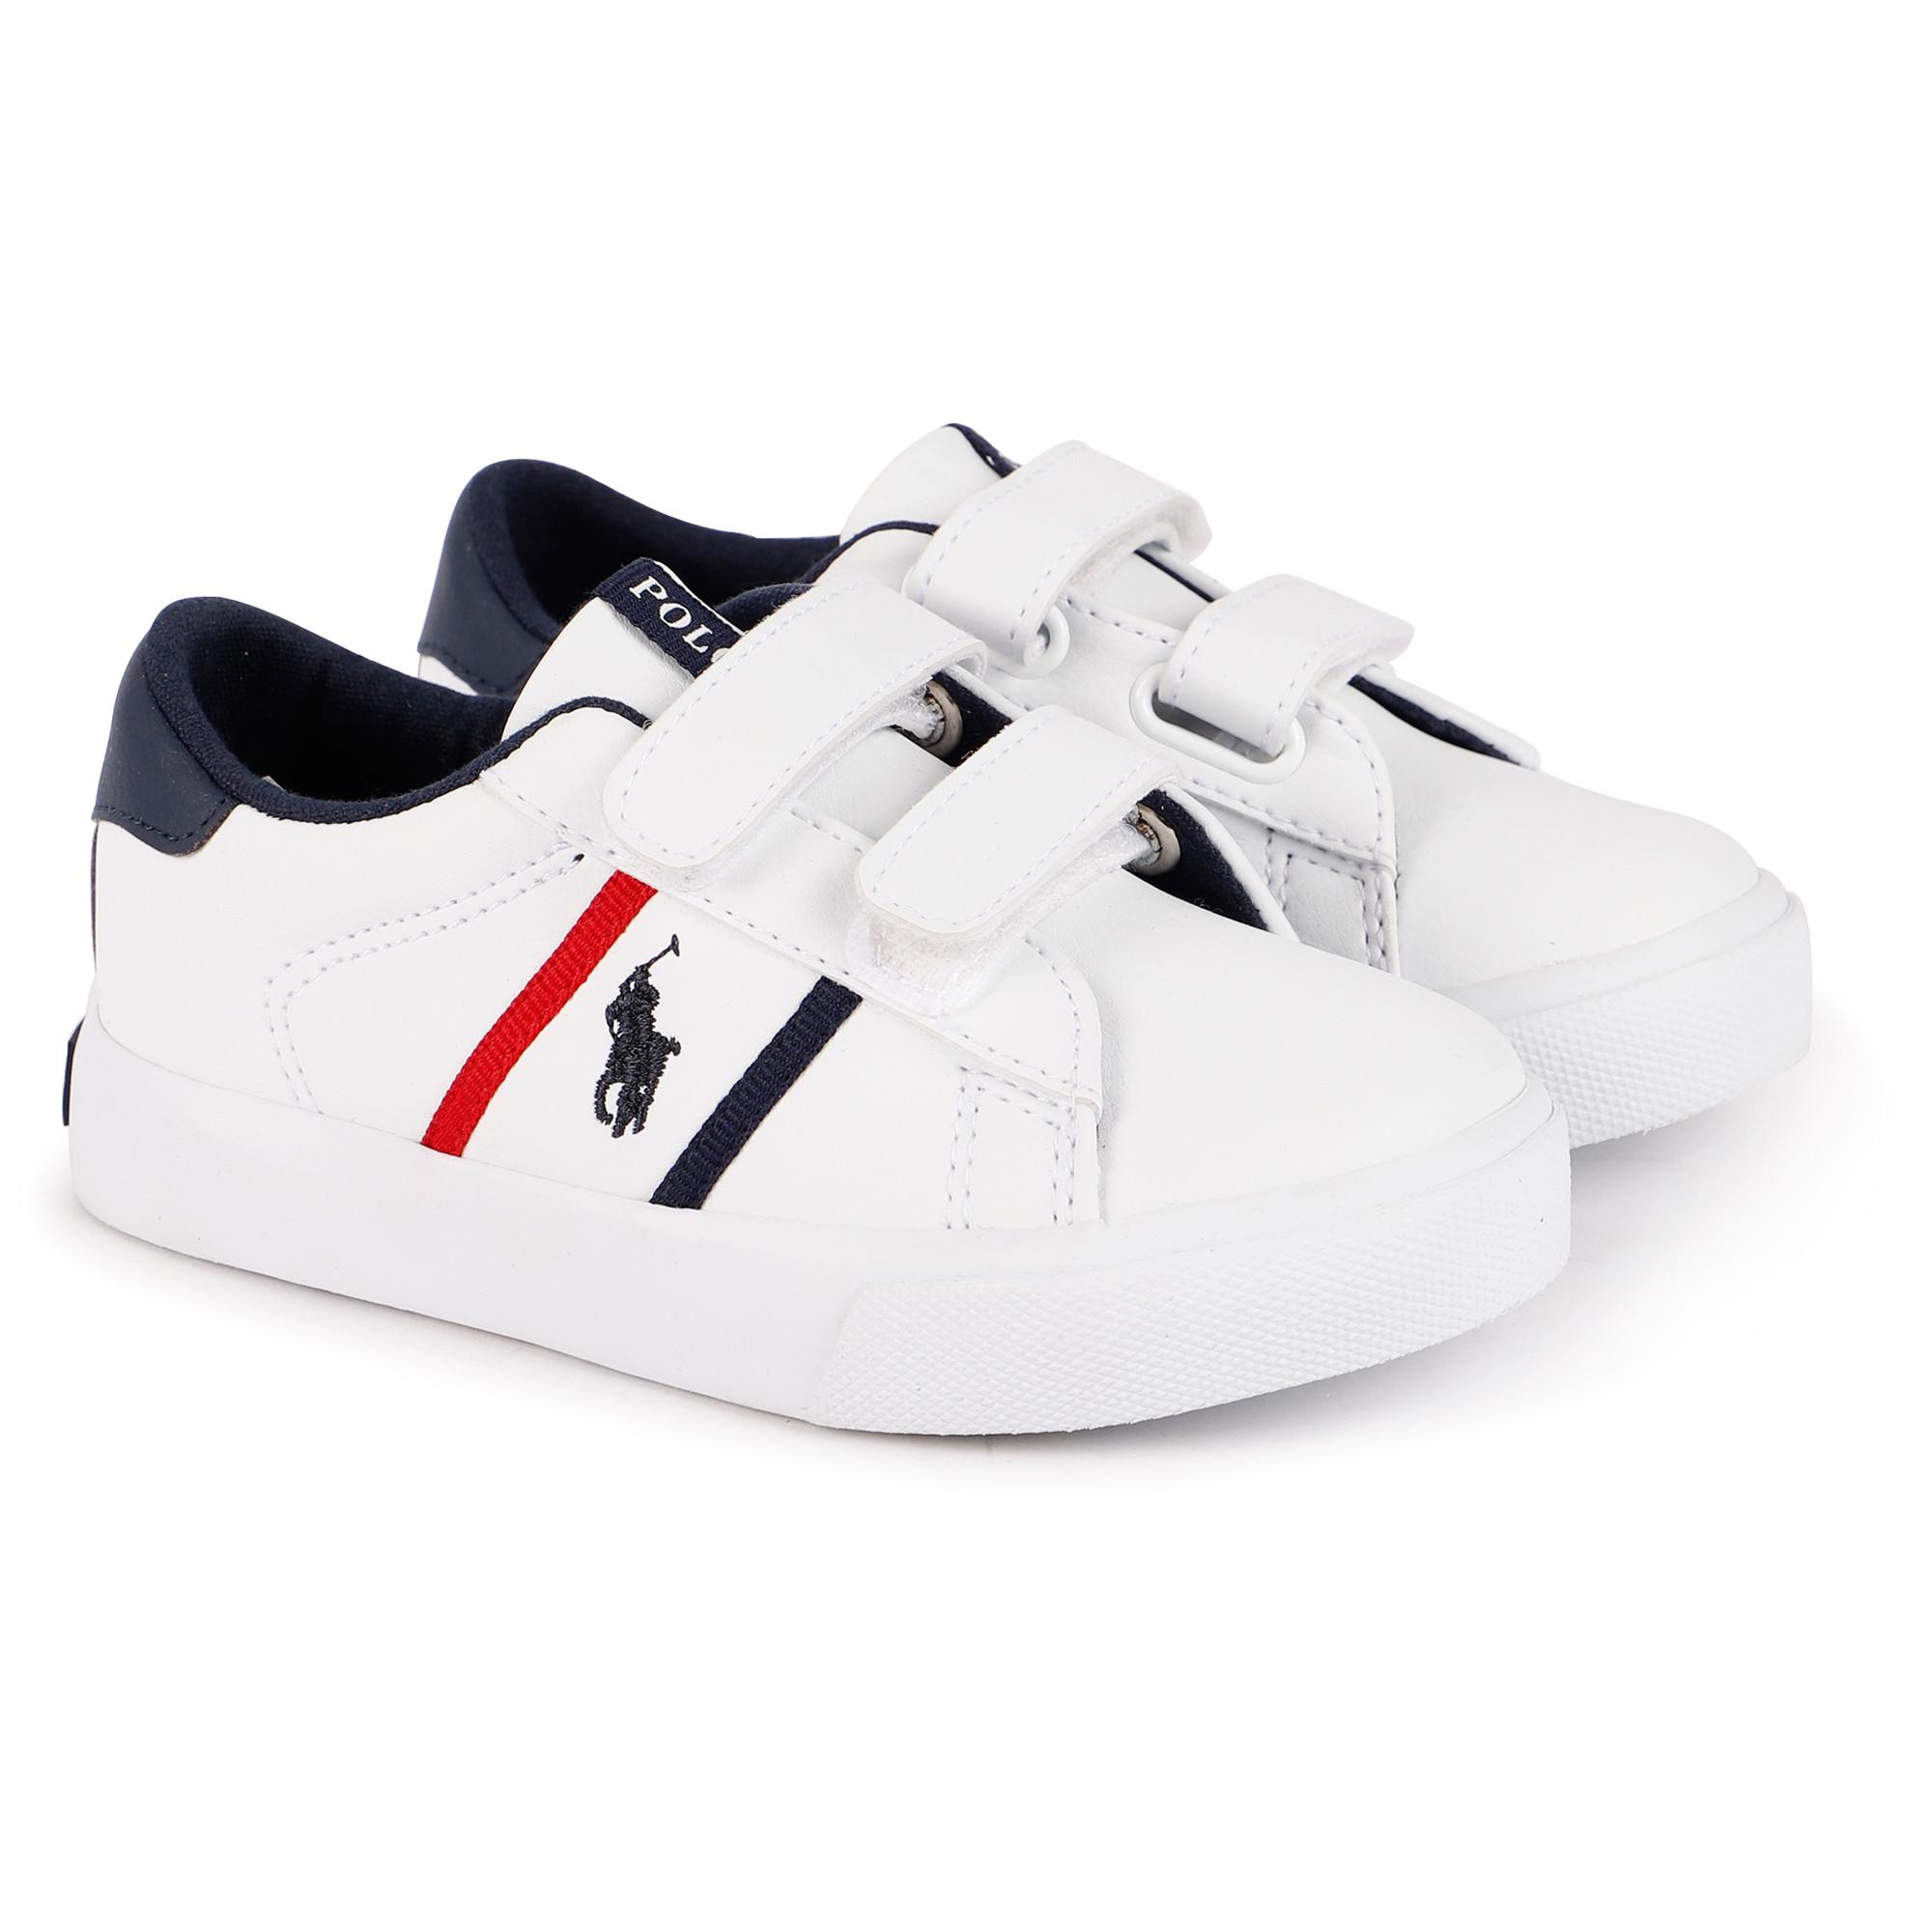 Polo Ralph Lauren Logo Velcro Sneakers